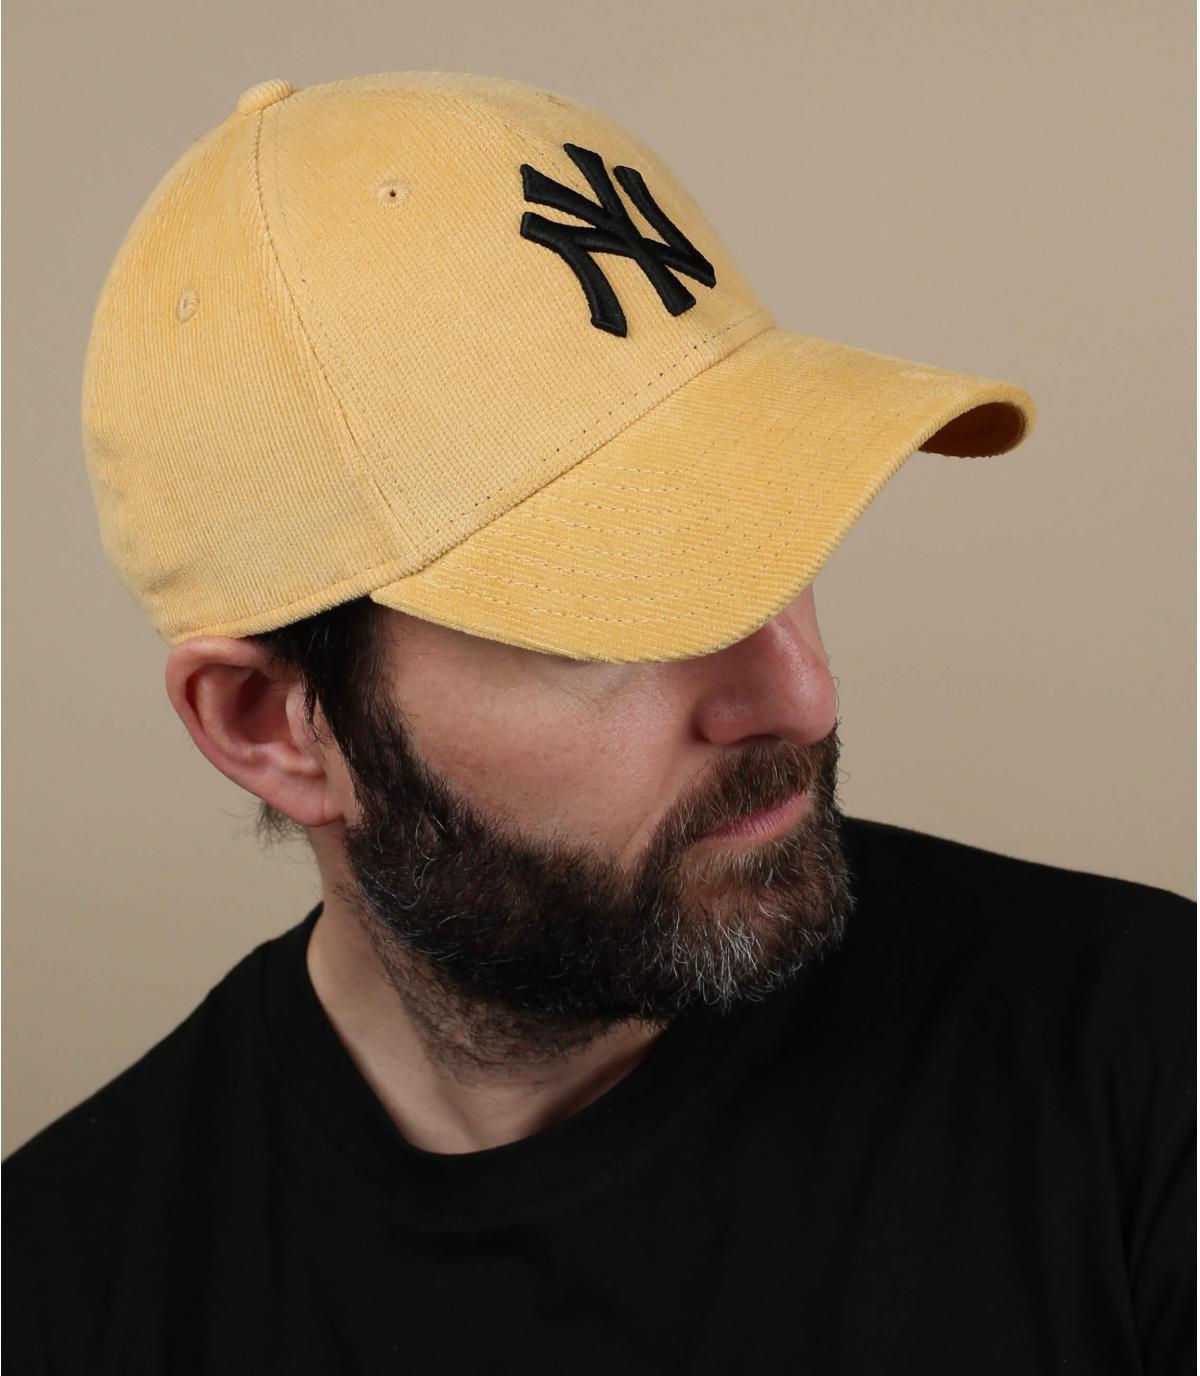 Cappellino NY in velluto giallo